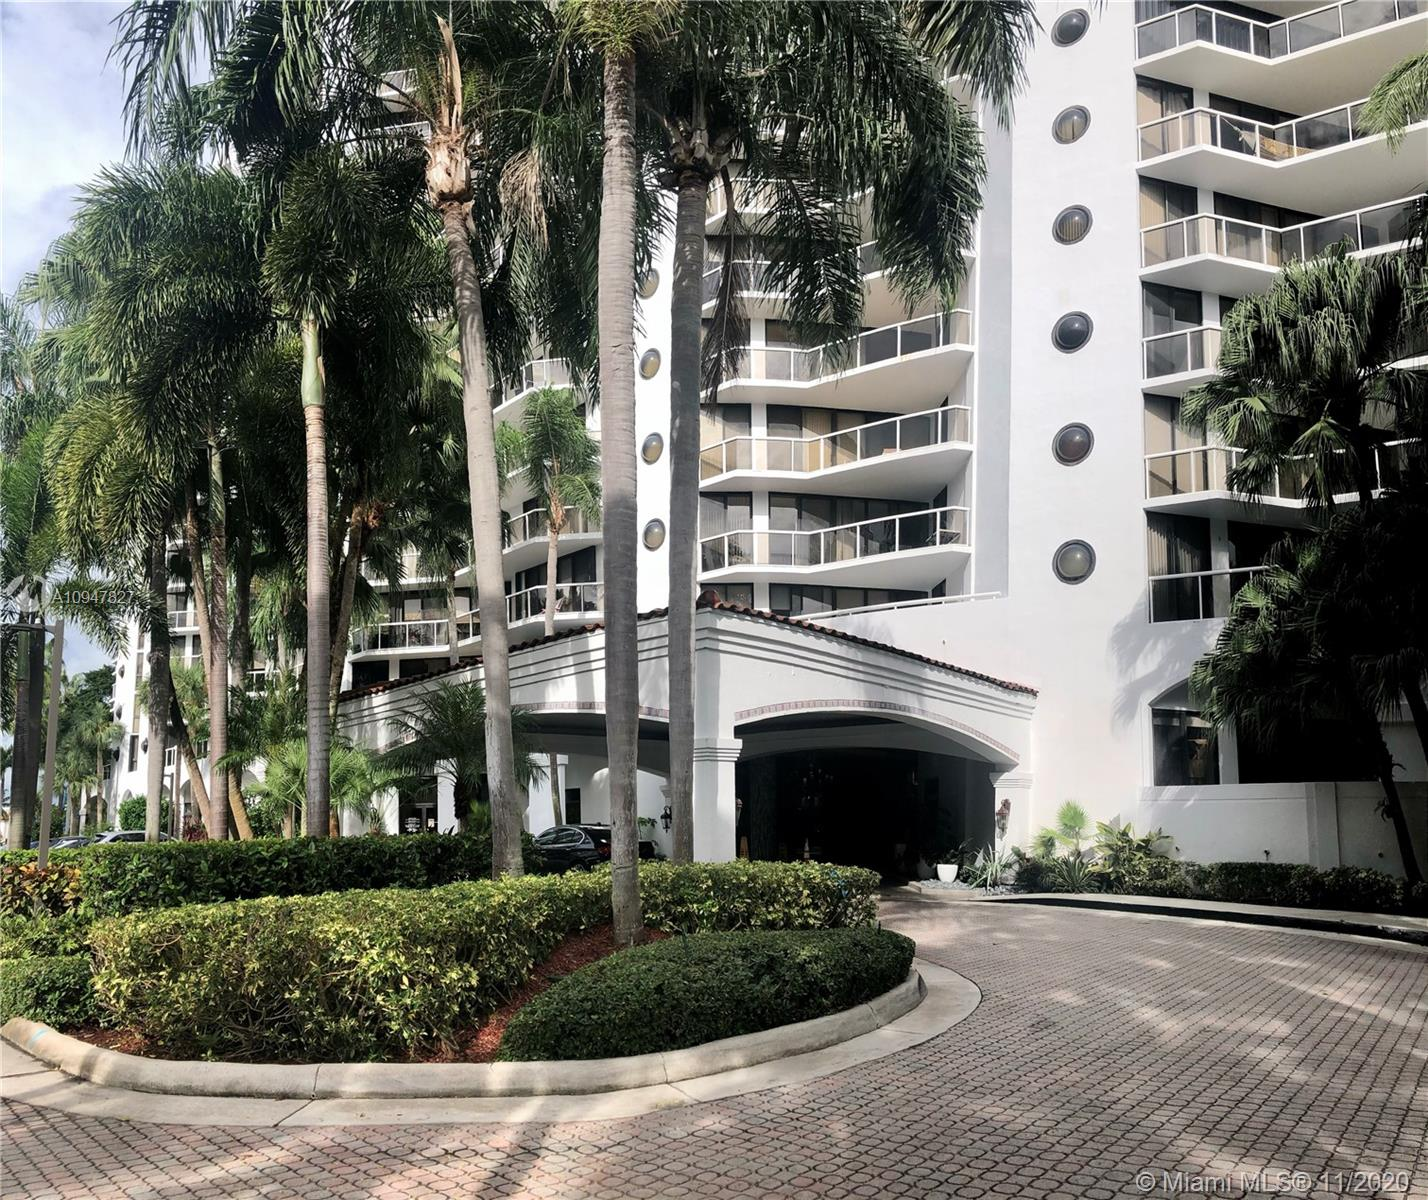 Portsview #1014 - 3610 Yacht Club Dr #1014, Aventura, FL 33180